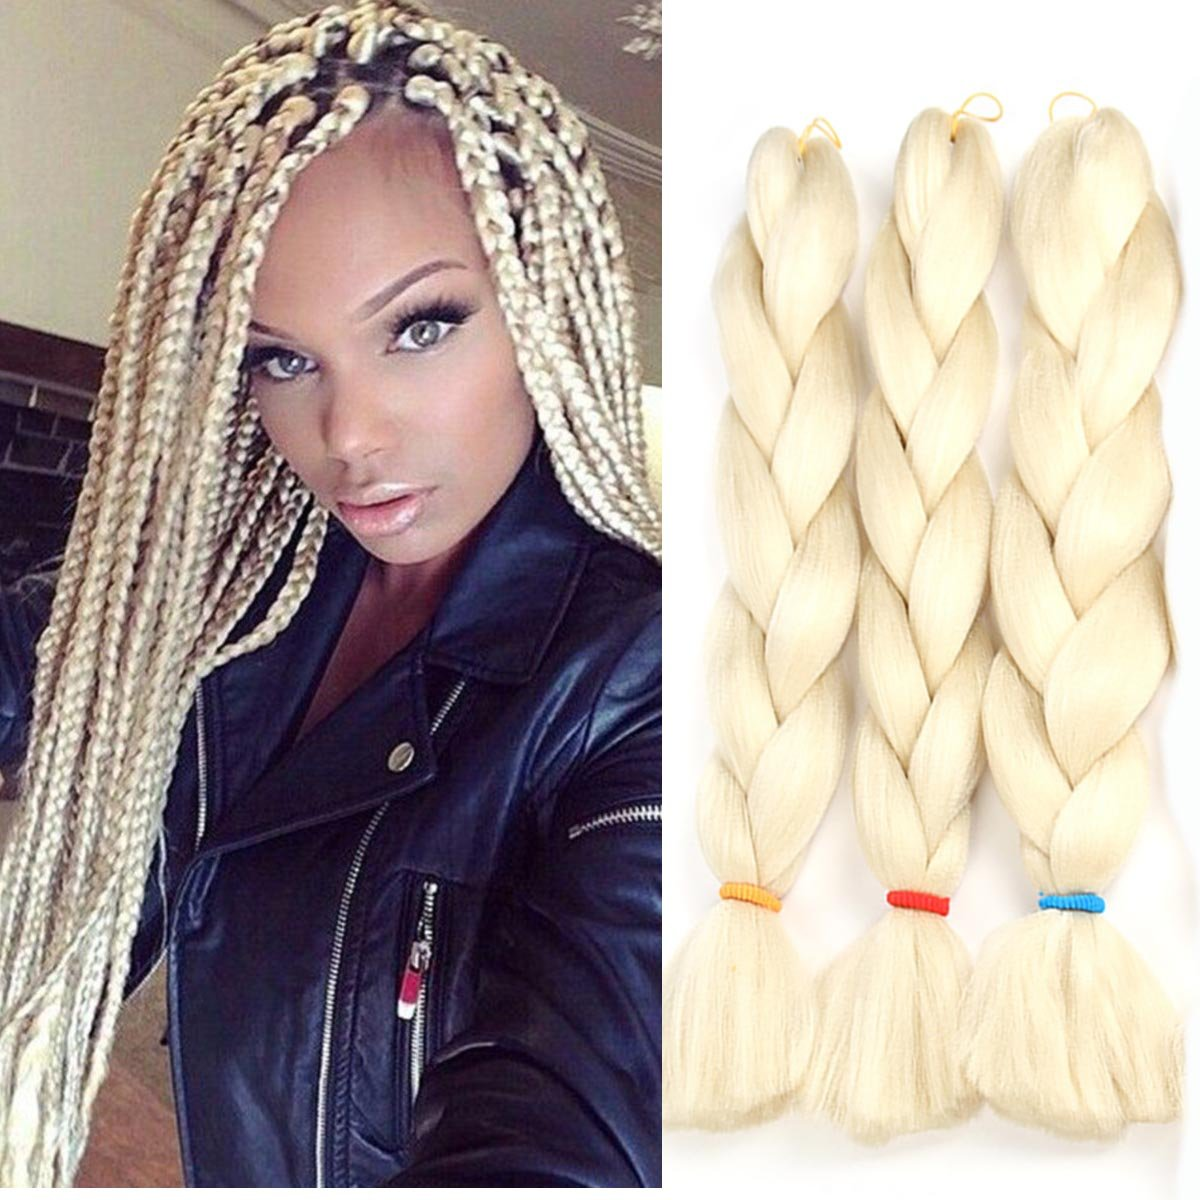 Amazon.com : VCKOVCKO Pink Jumbo Braid Crochet Braids Hair ...